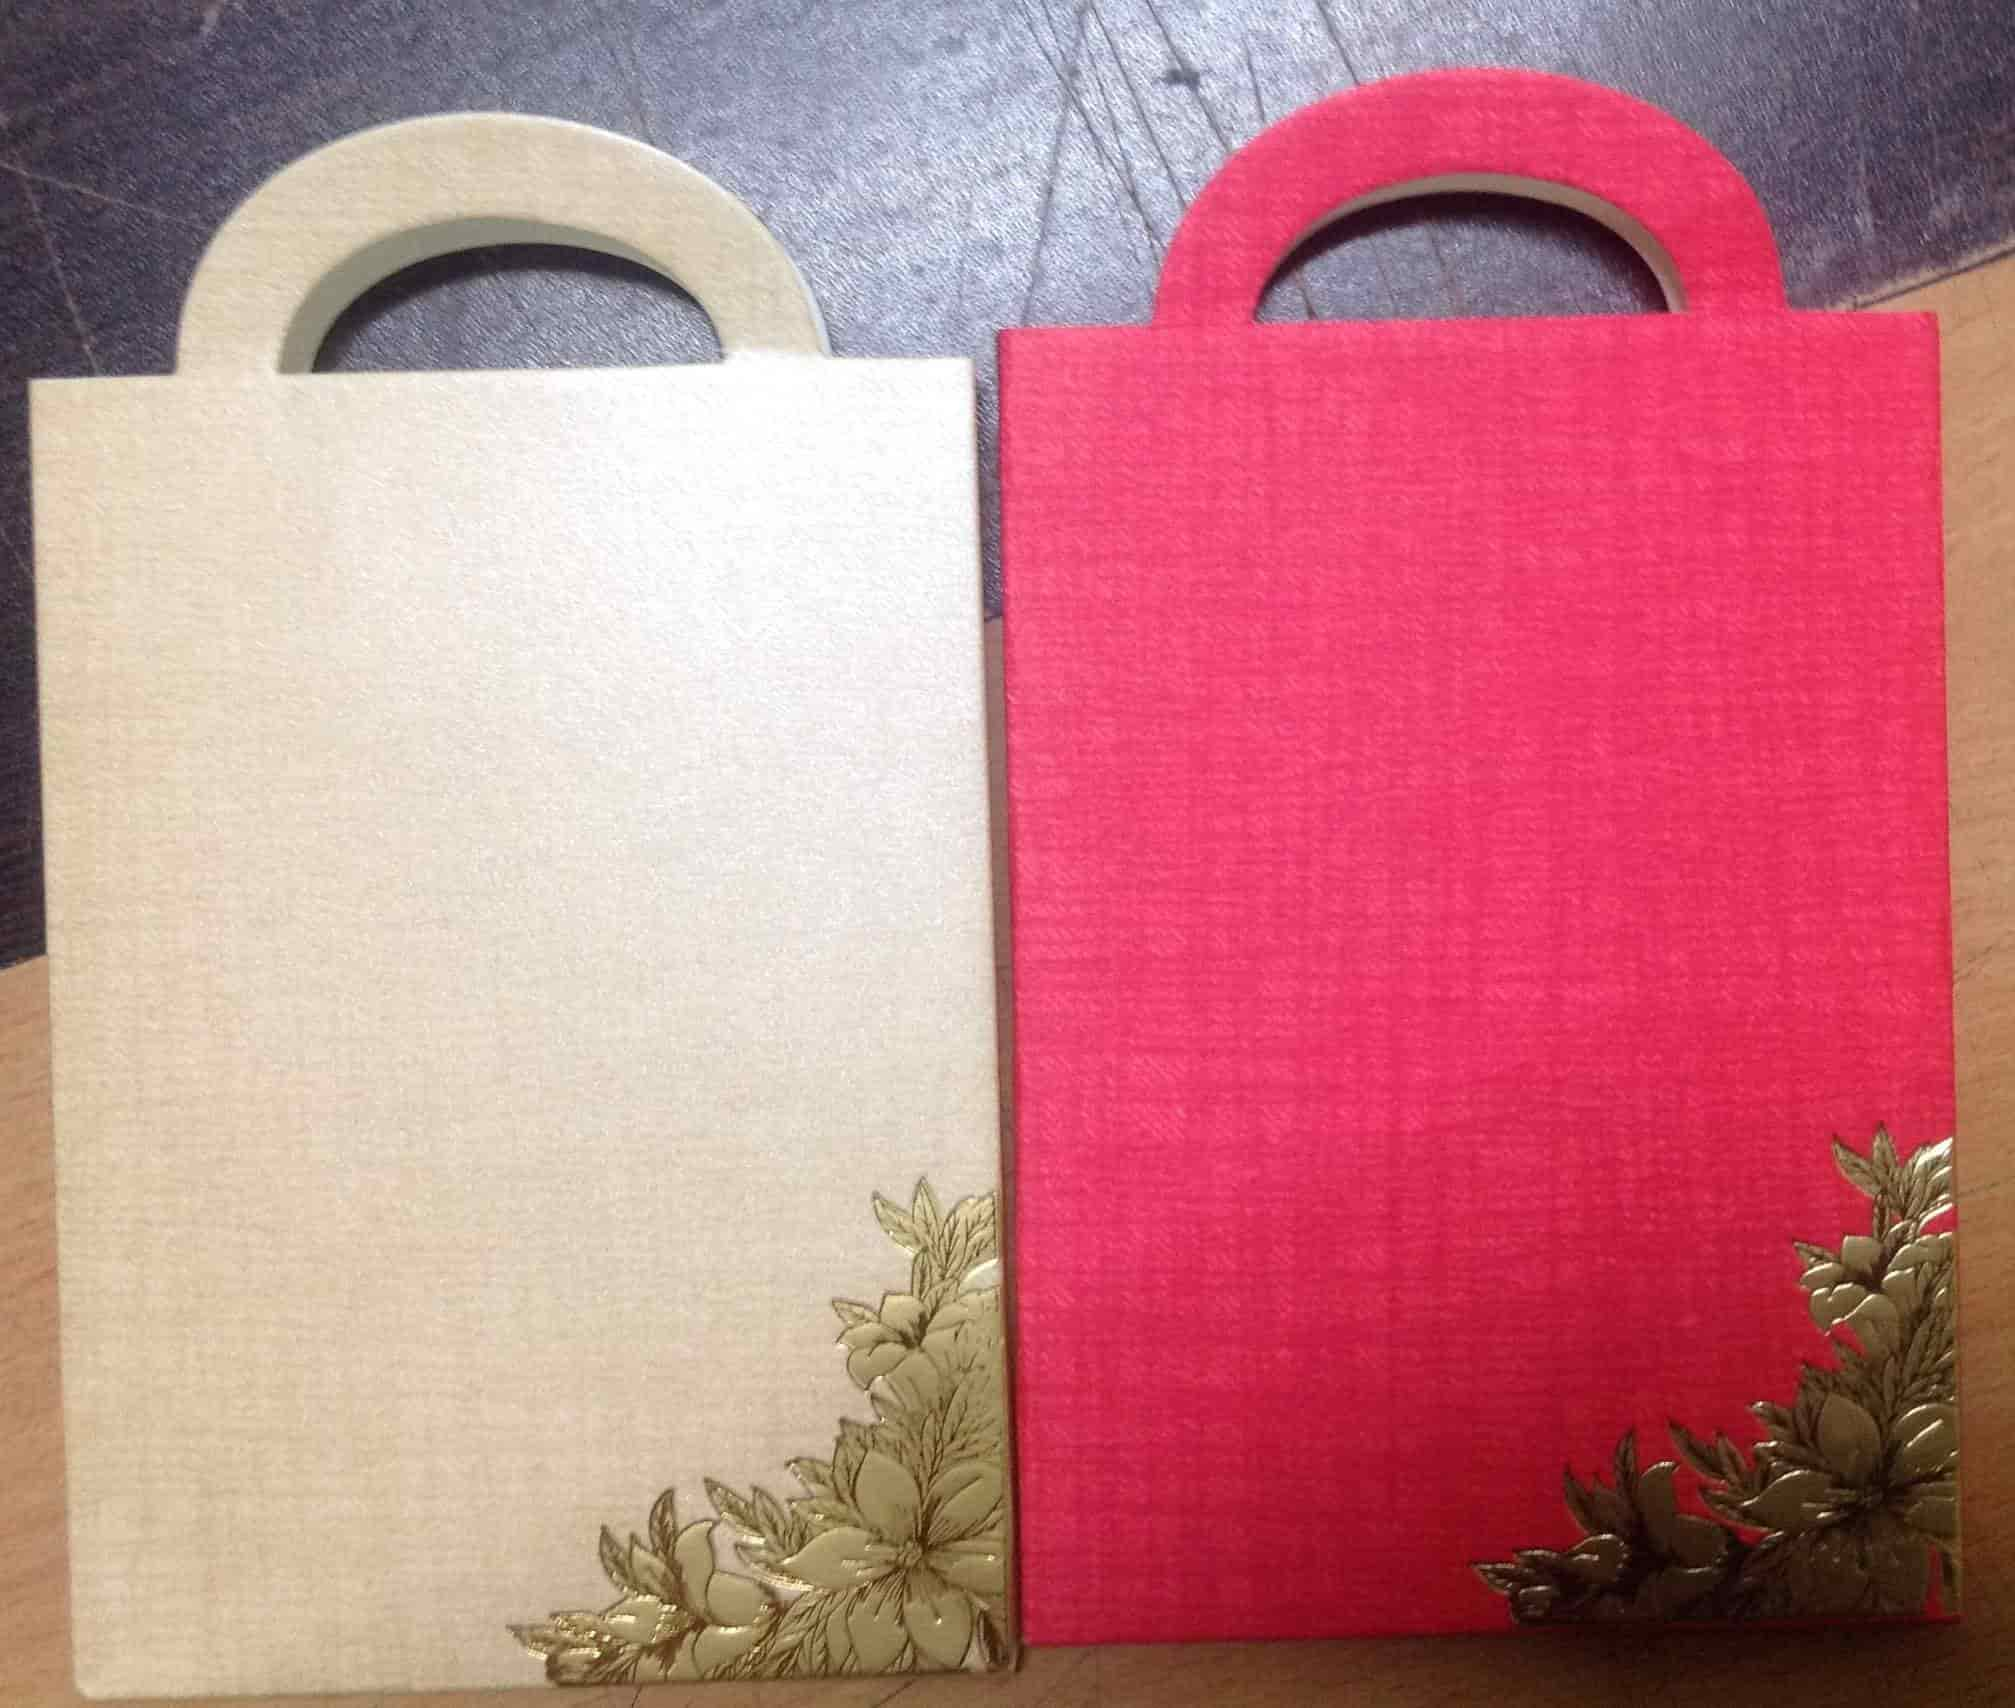 Sri Parshwa Cards Jayanagar 4th T Block Wedding Card